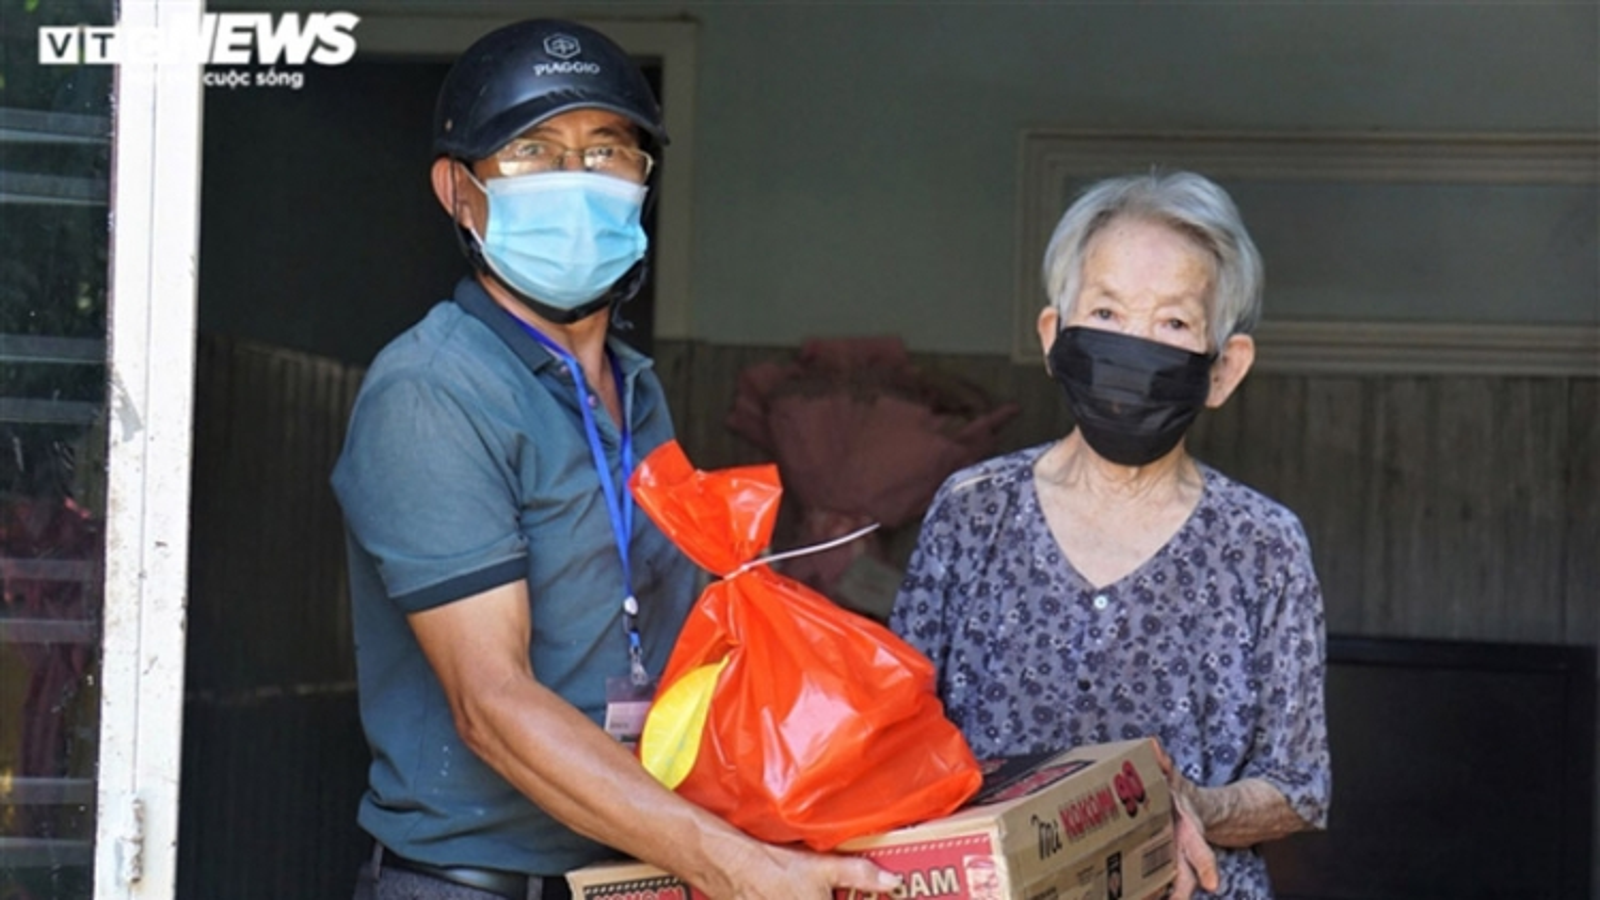 Locals in Da Nang receive necessities for COVID-19 fight